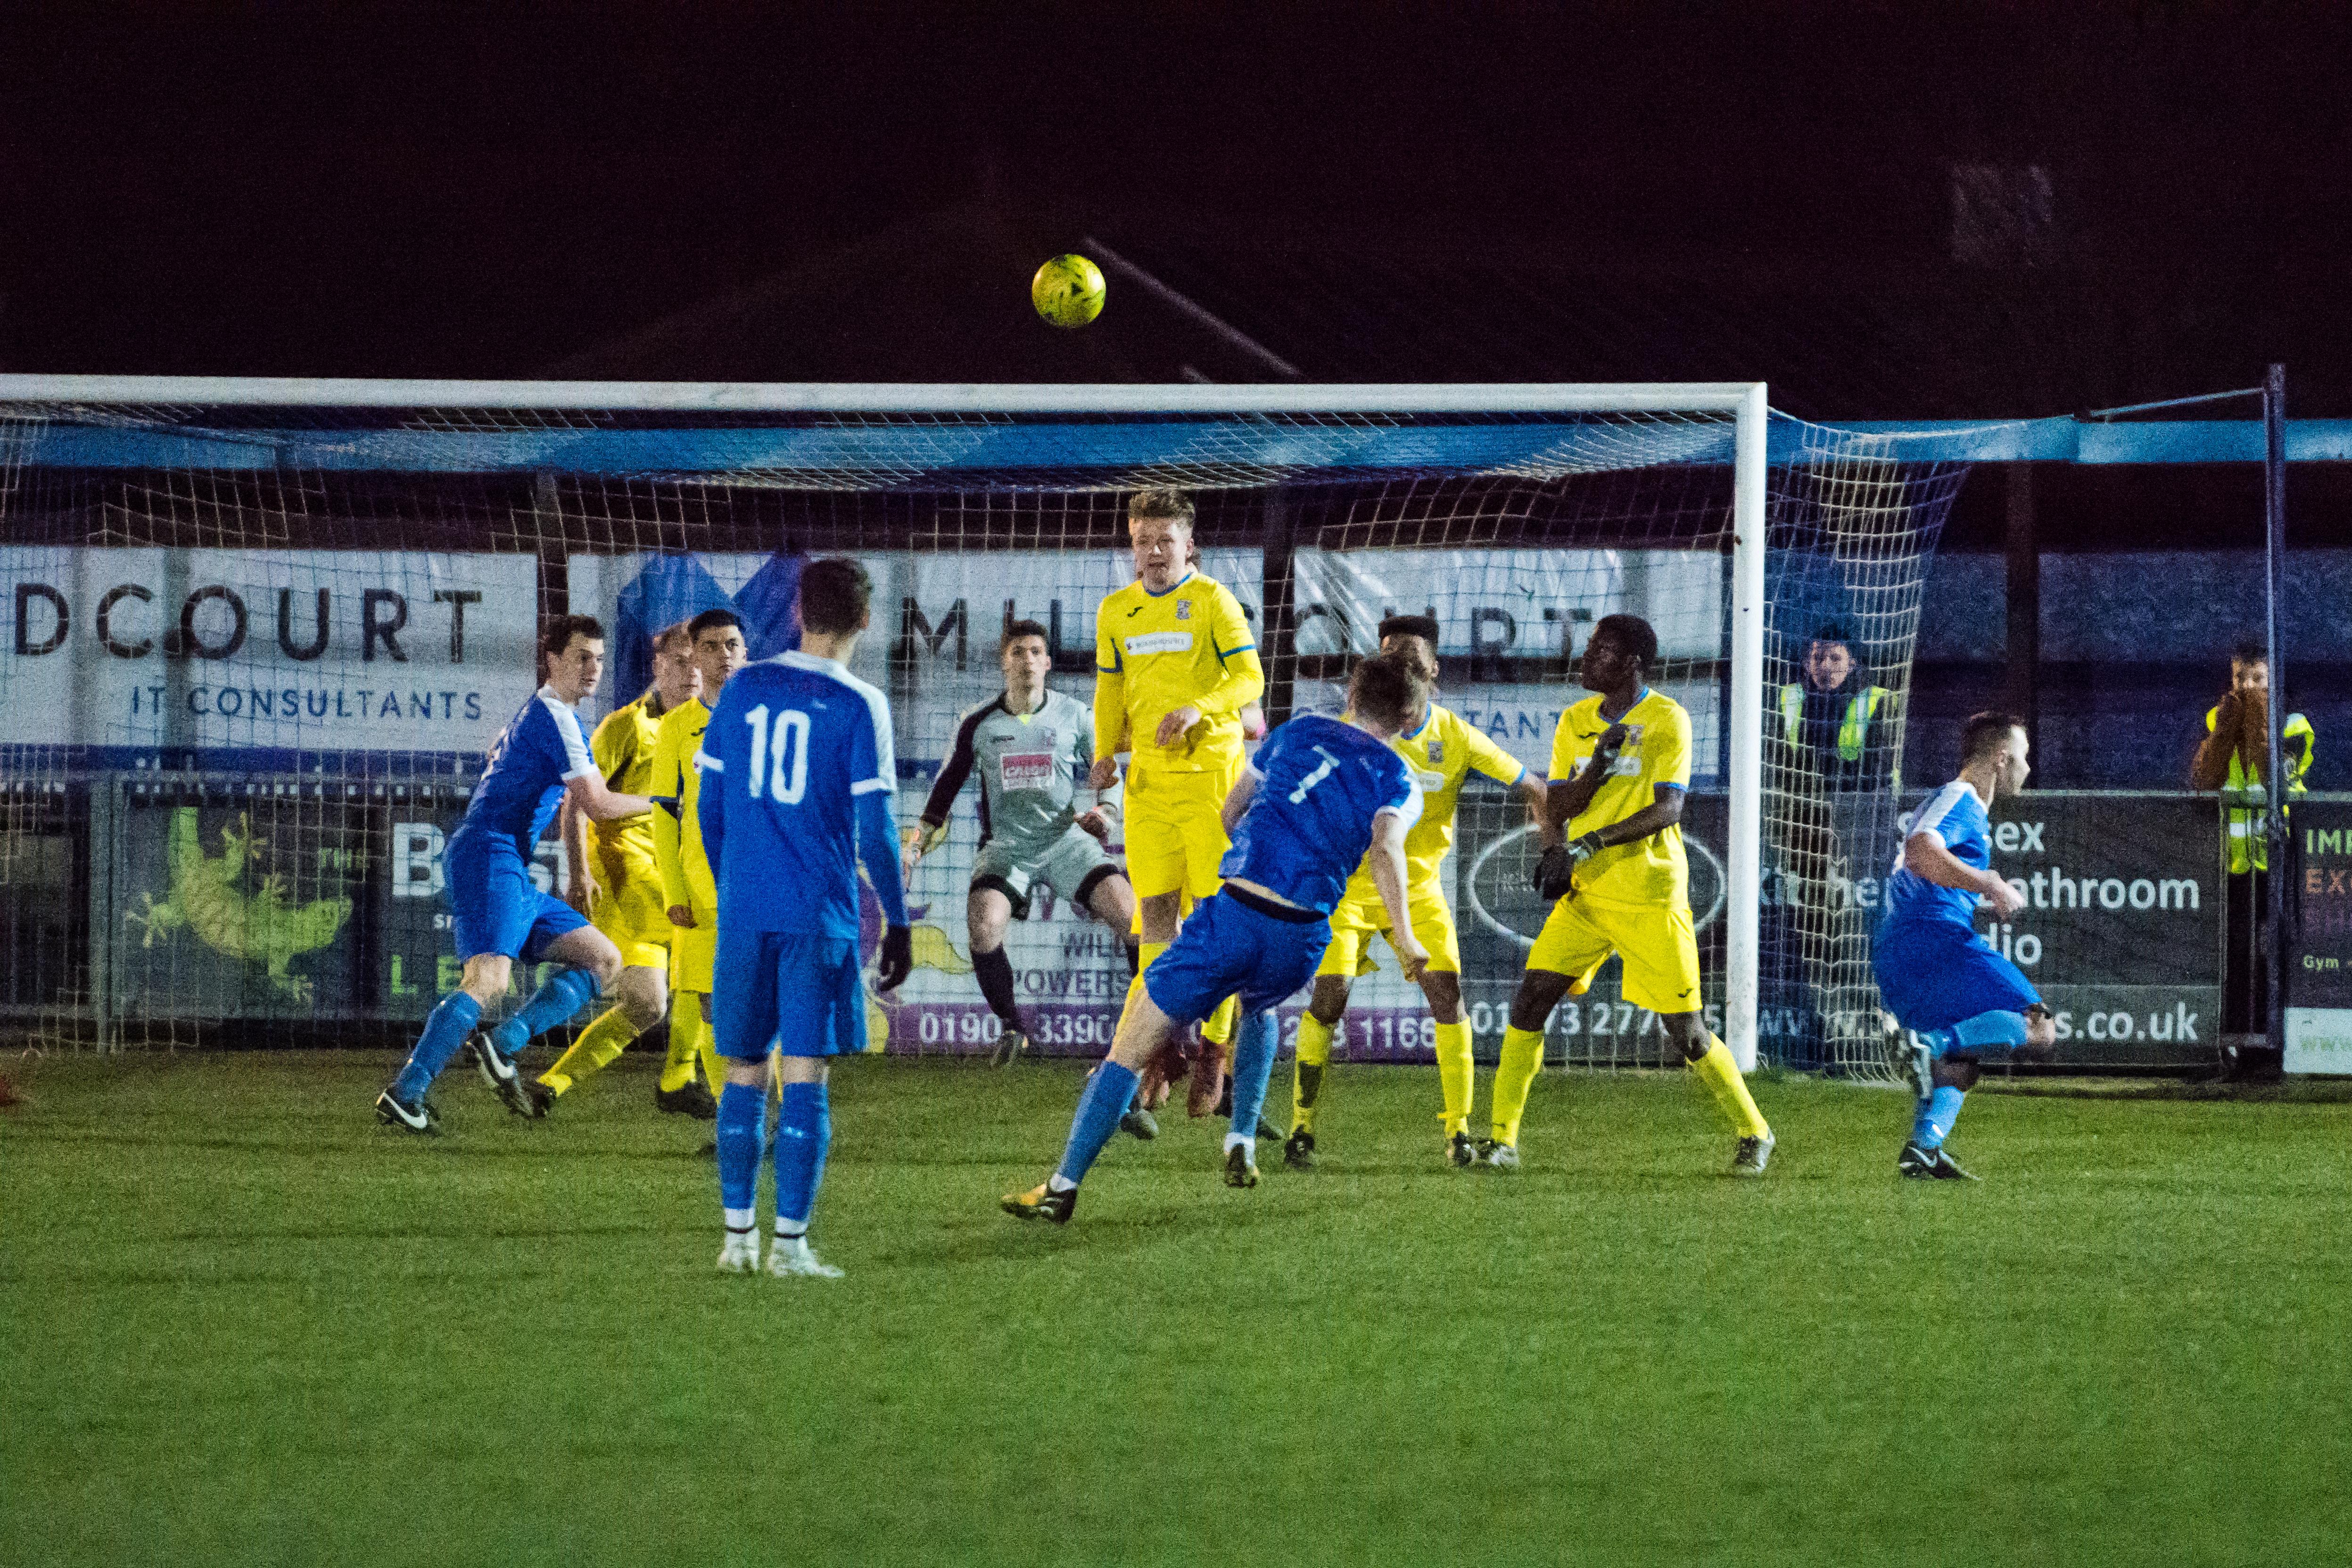 DAVID_JEFFERY Shoreham FC U18s vs Woking FC Academy 22.03.18 64